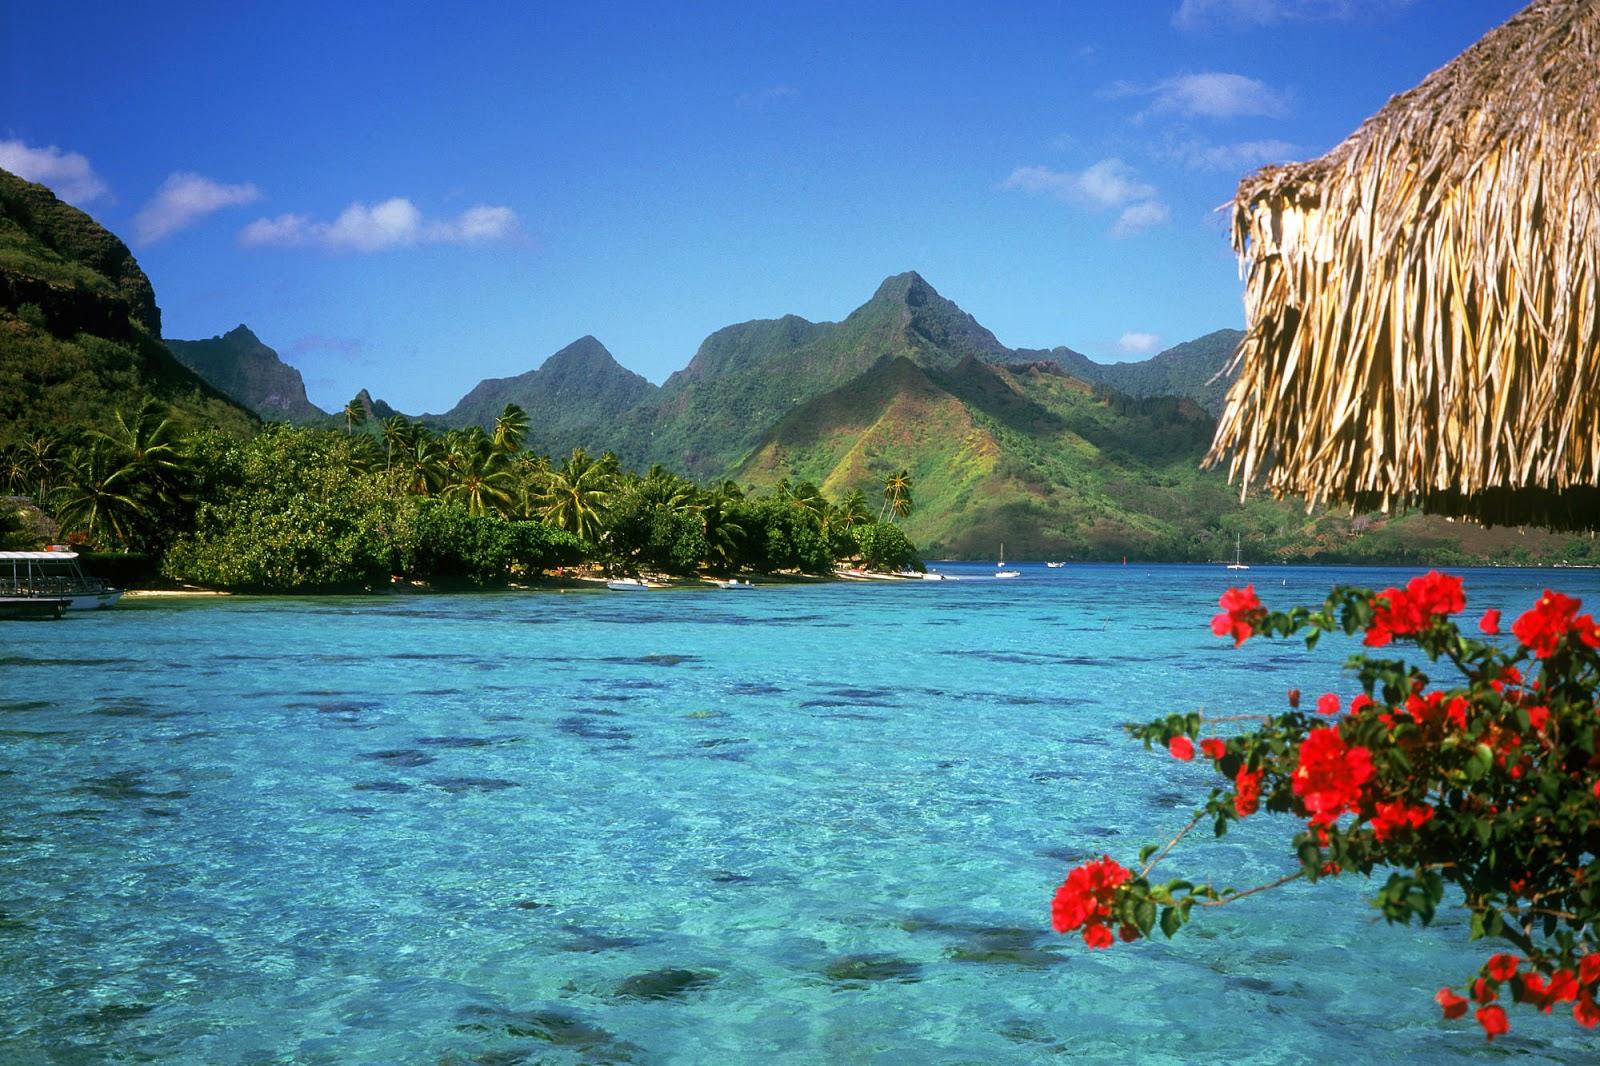 Lagoon Tropical Island: Tropical Lagoon Wallpapers